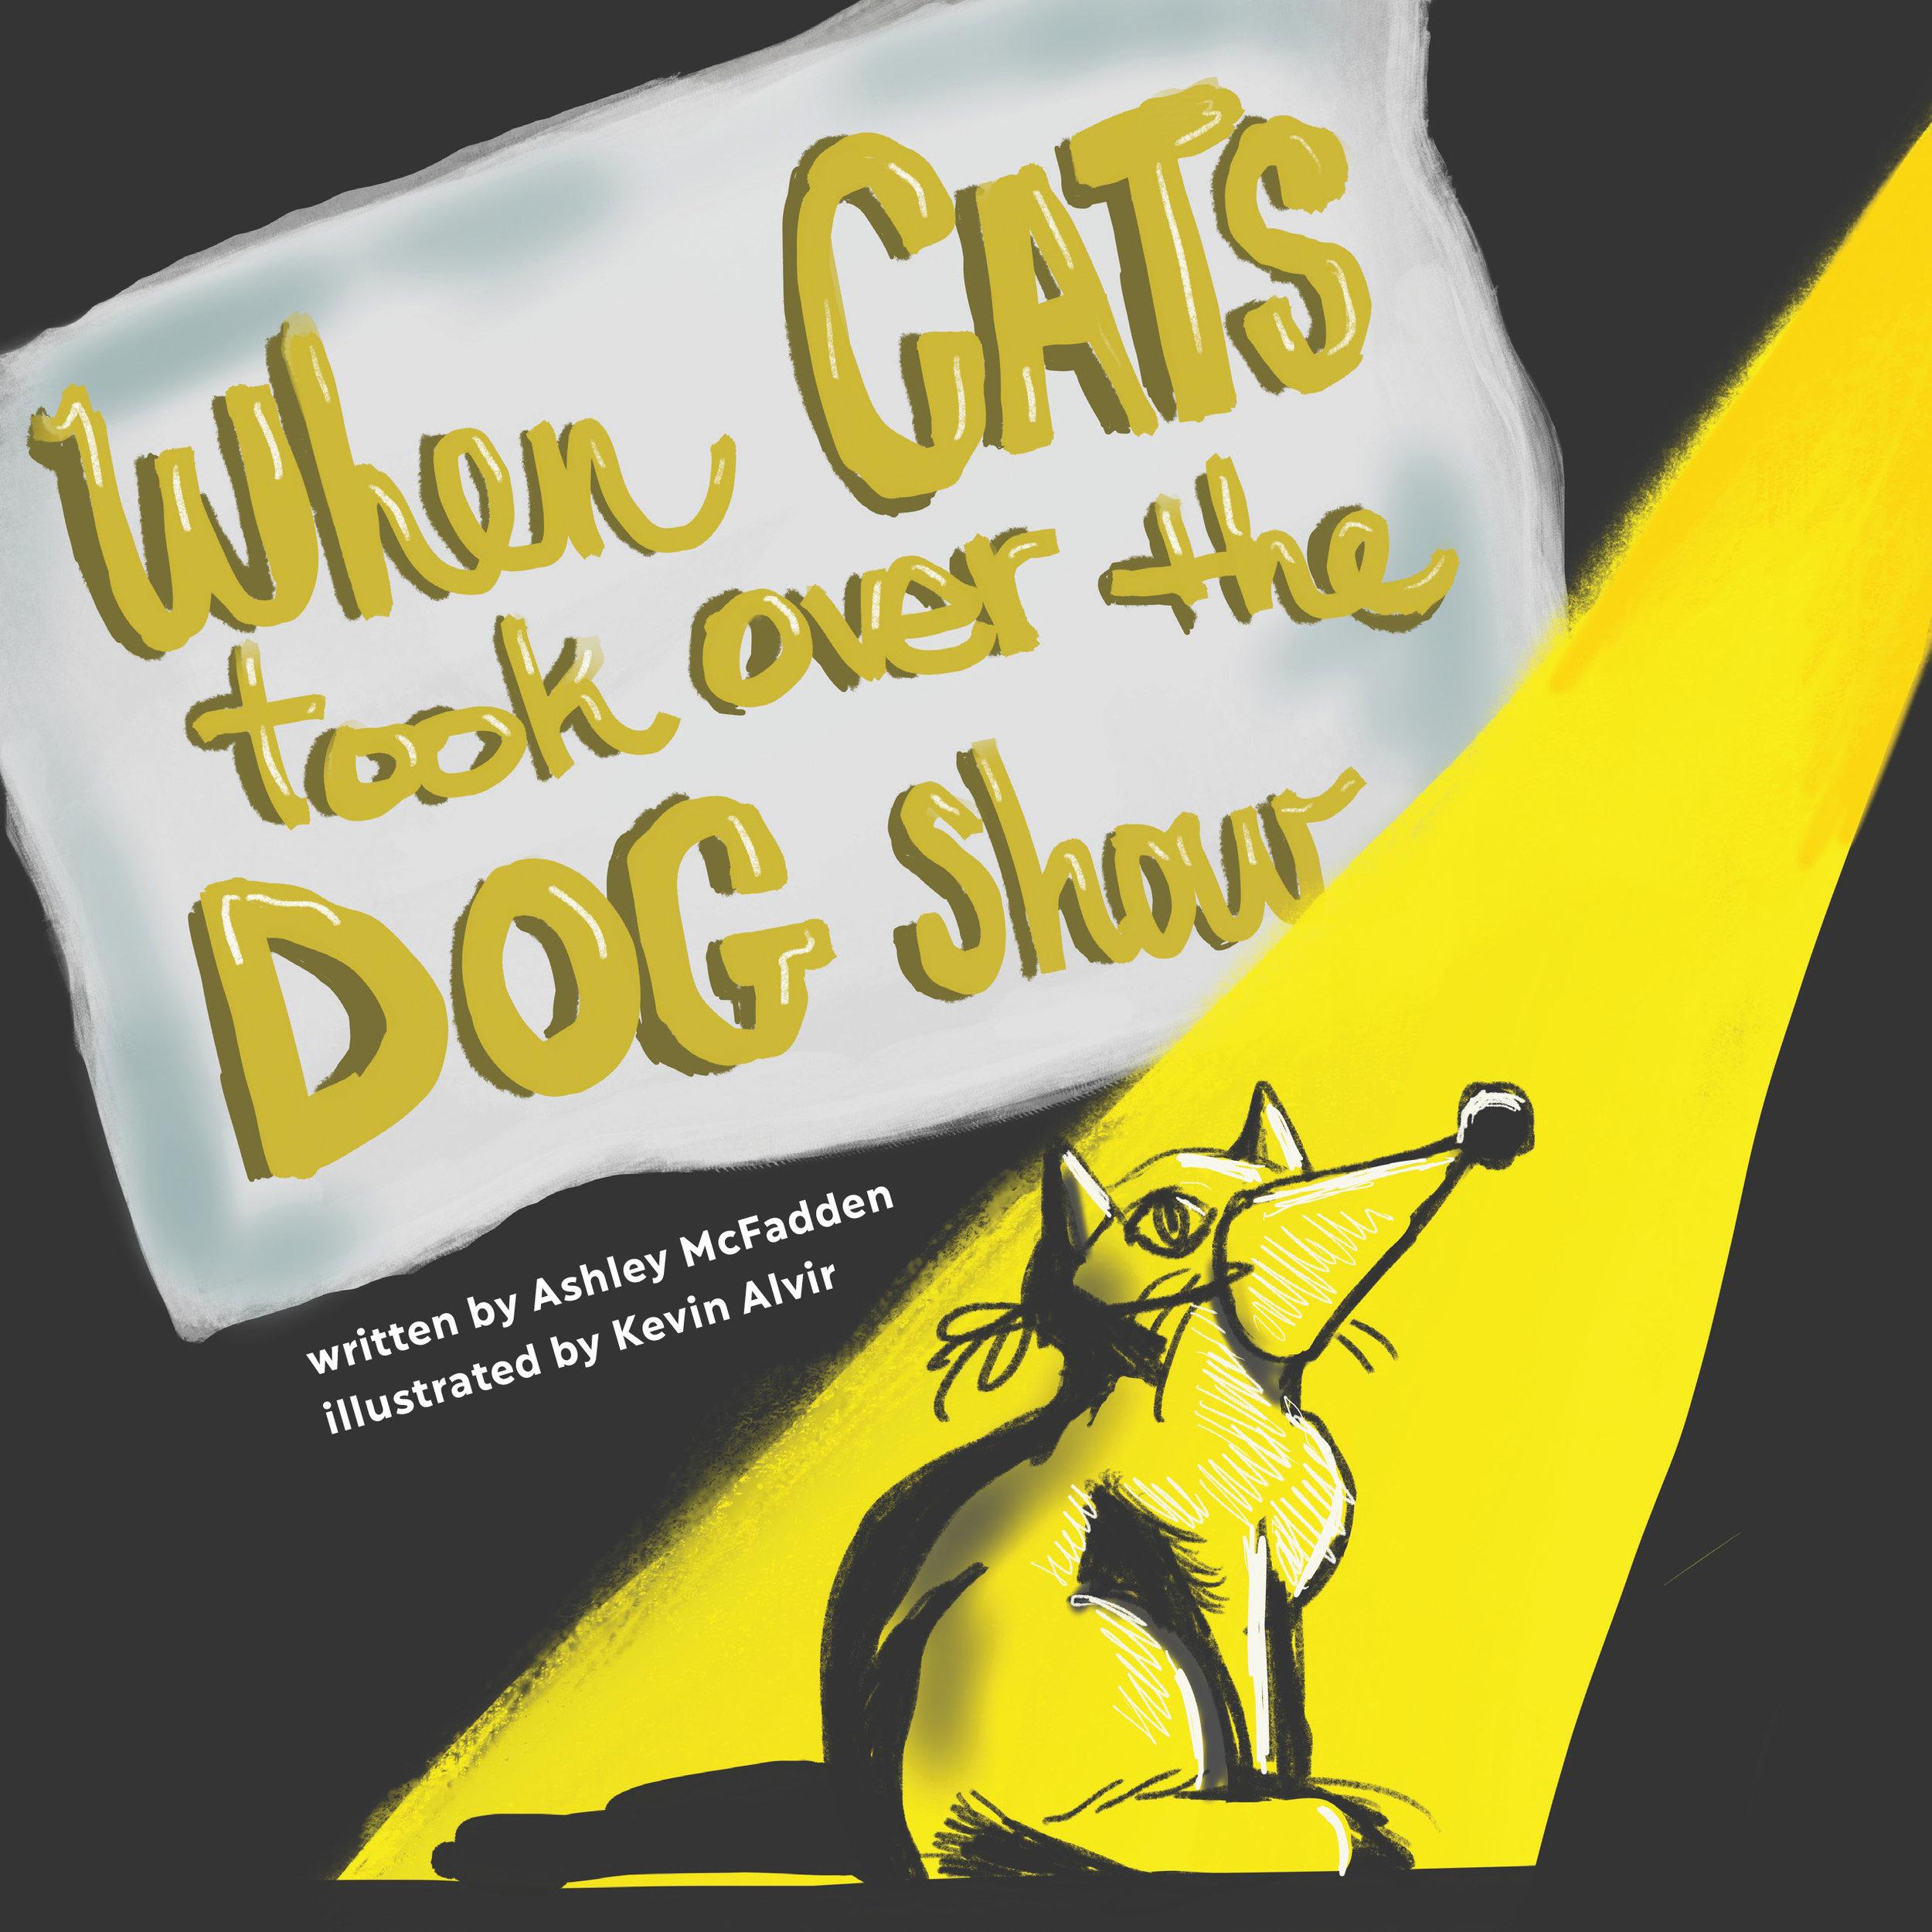 When Cats Took Over the Dog Show / Ashley McFadden & Kevin Alvir